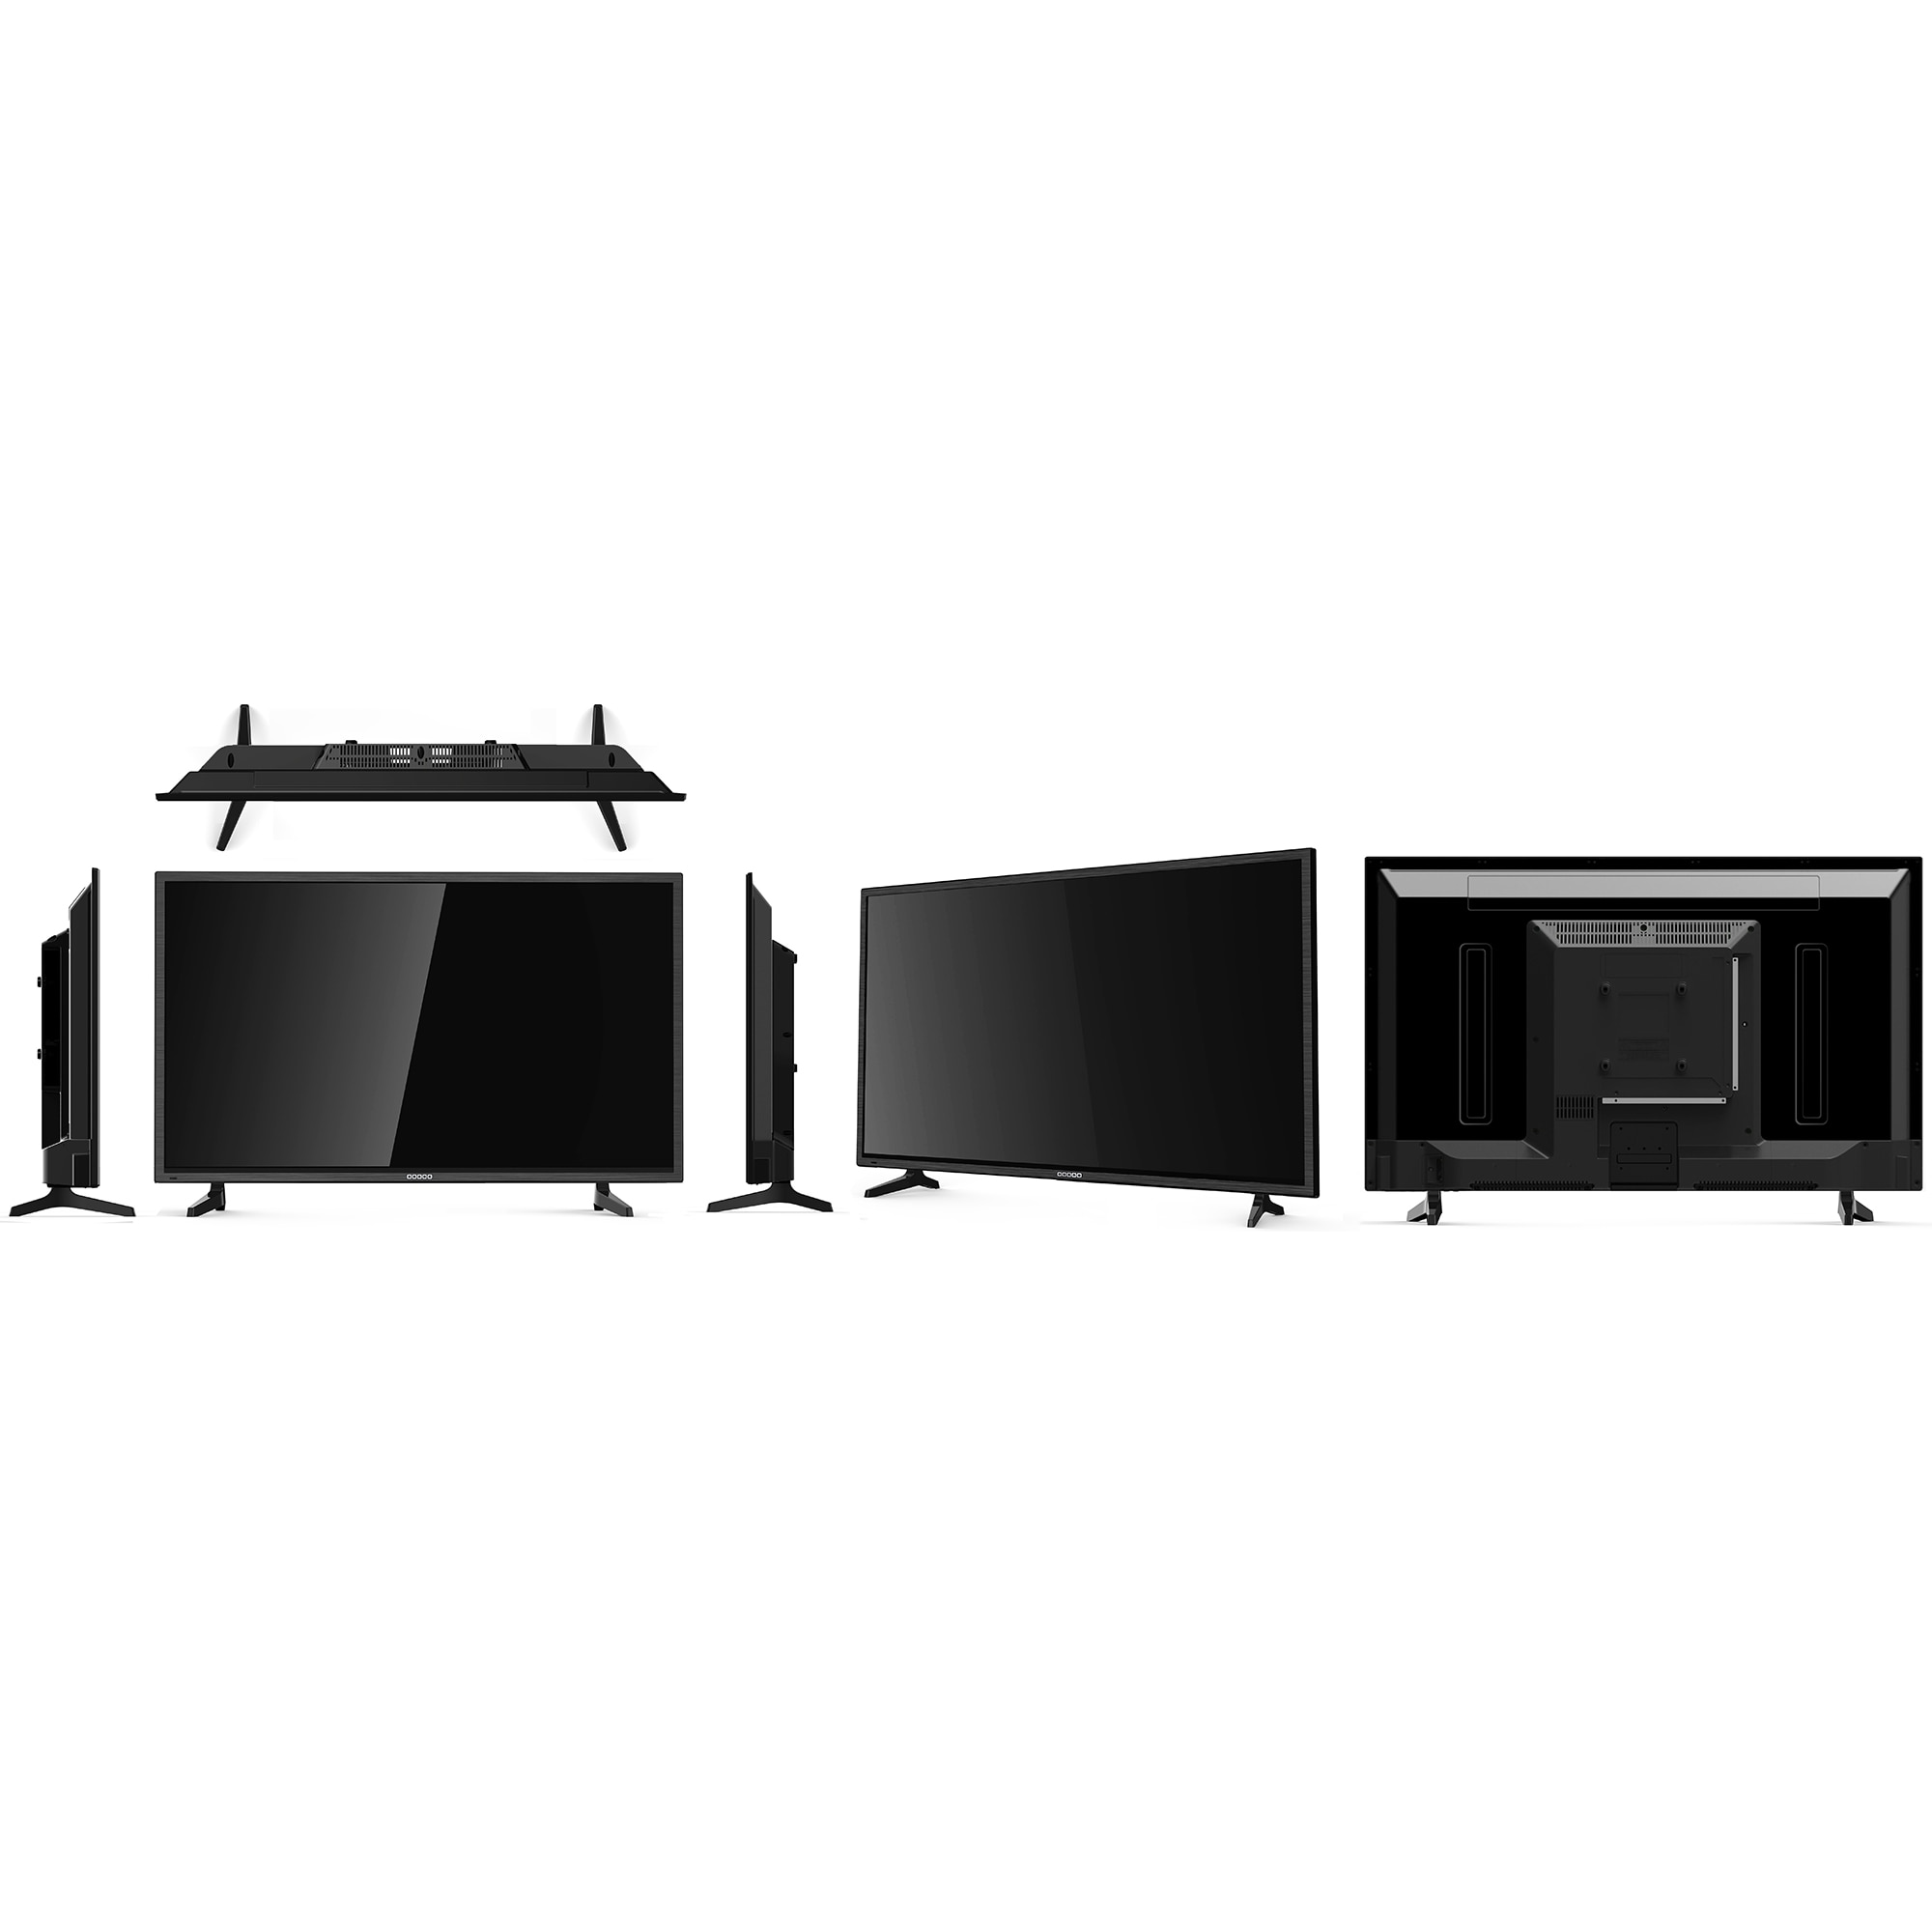 Televizor LED Blaupunkt, 102 cm, BLA-40/133O, Full HD ...